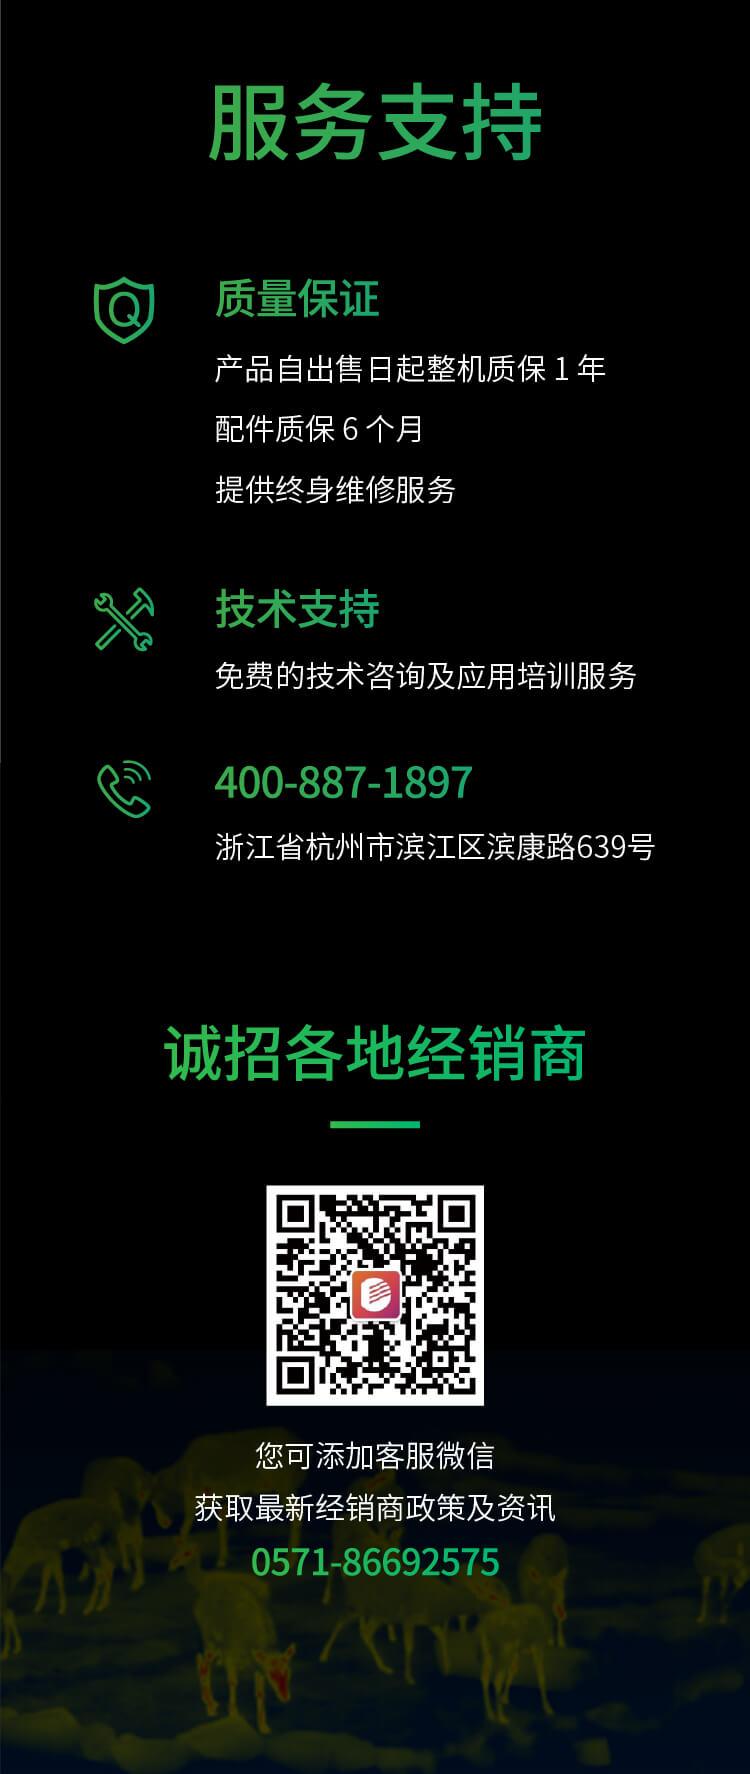 S24X详情页-0901改_06.jpg